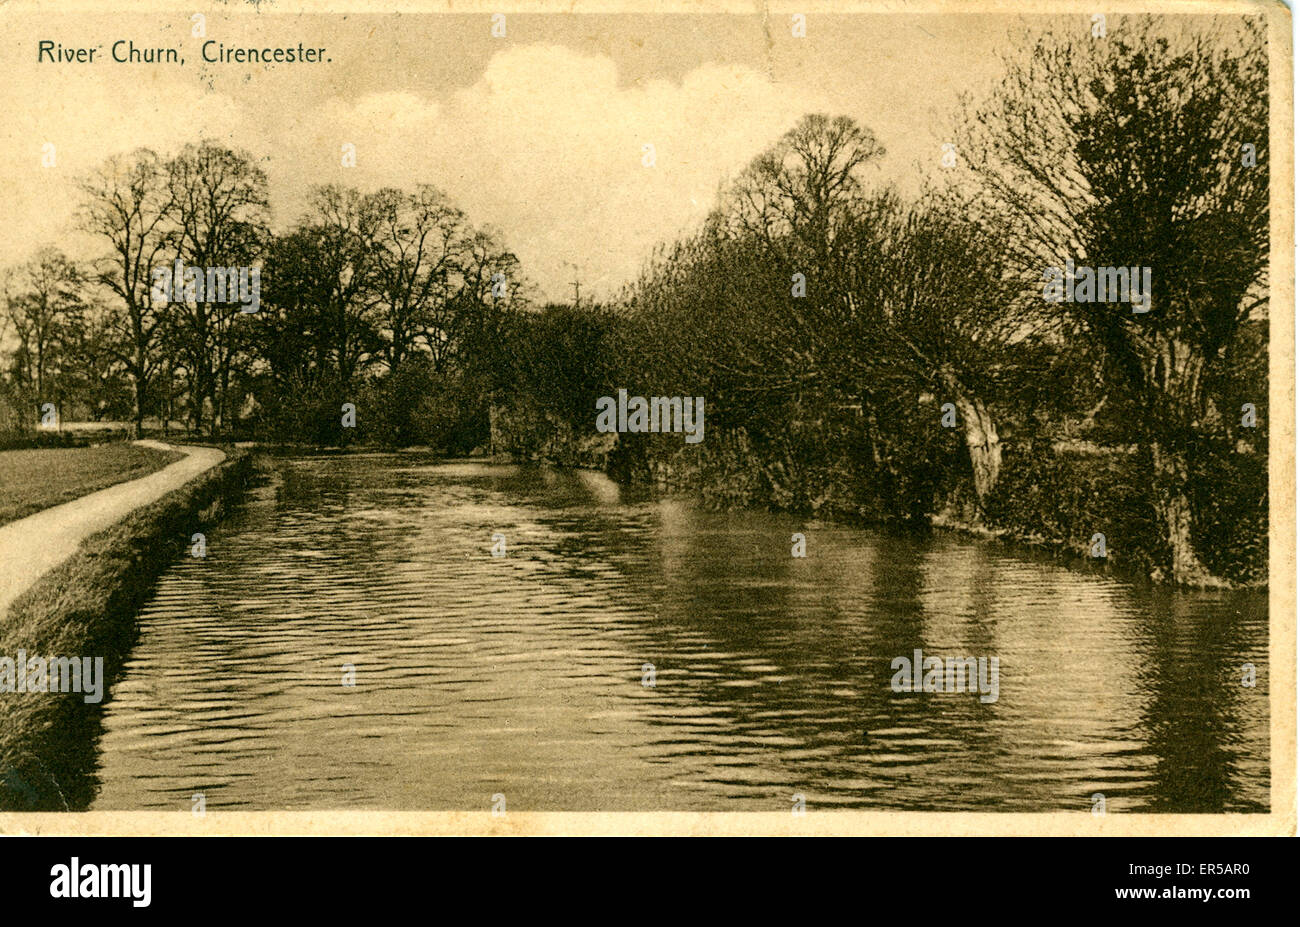 River Churn, Cirencester, Gloucestershire, England.  1910s Stock Photo